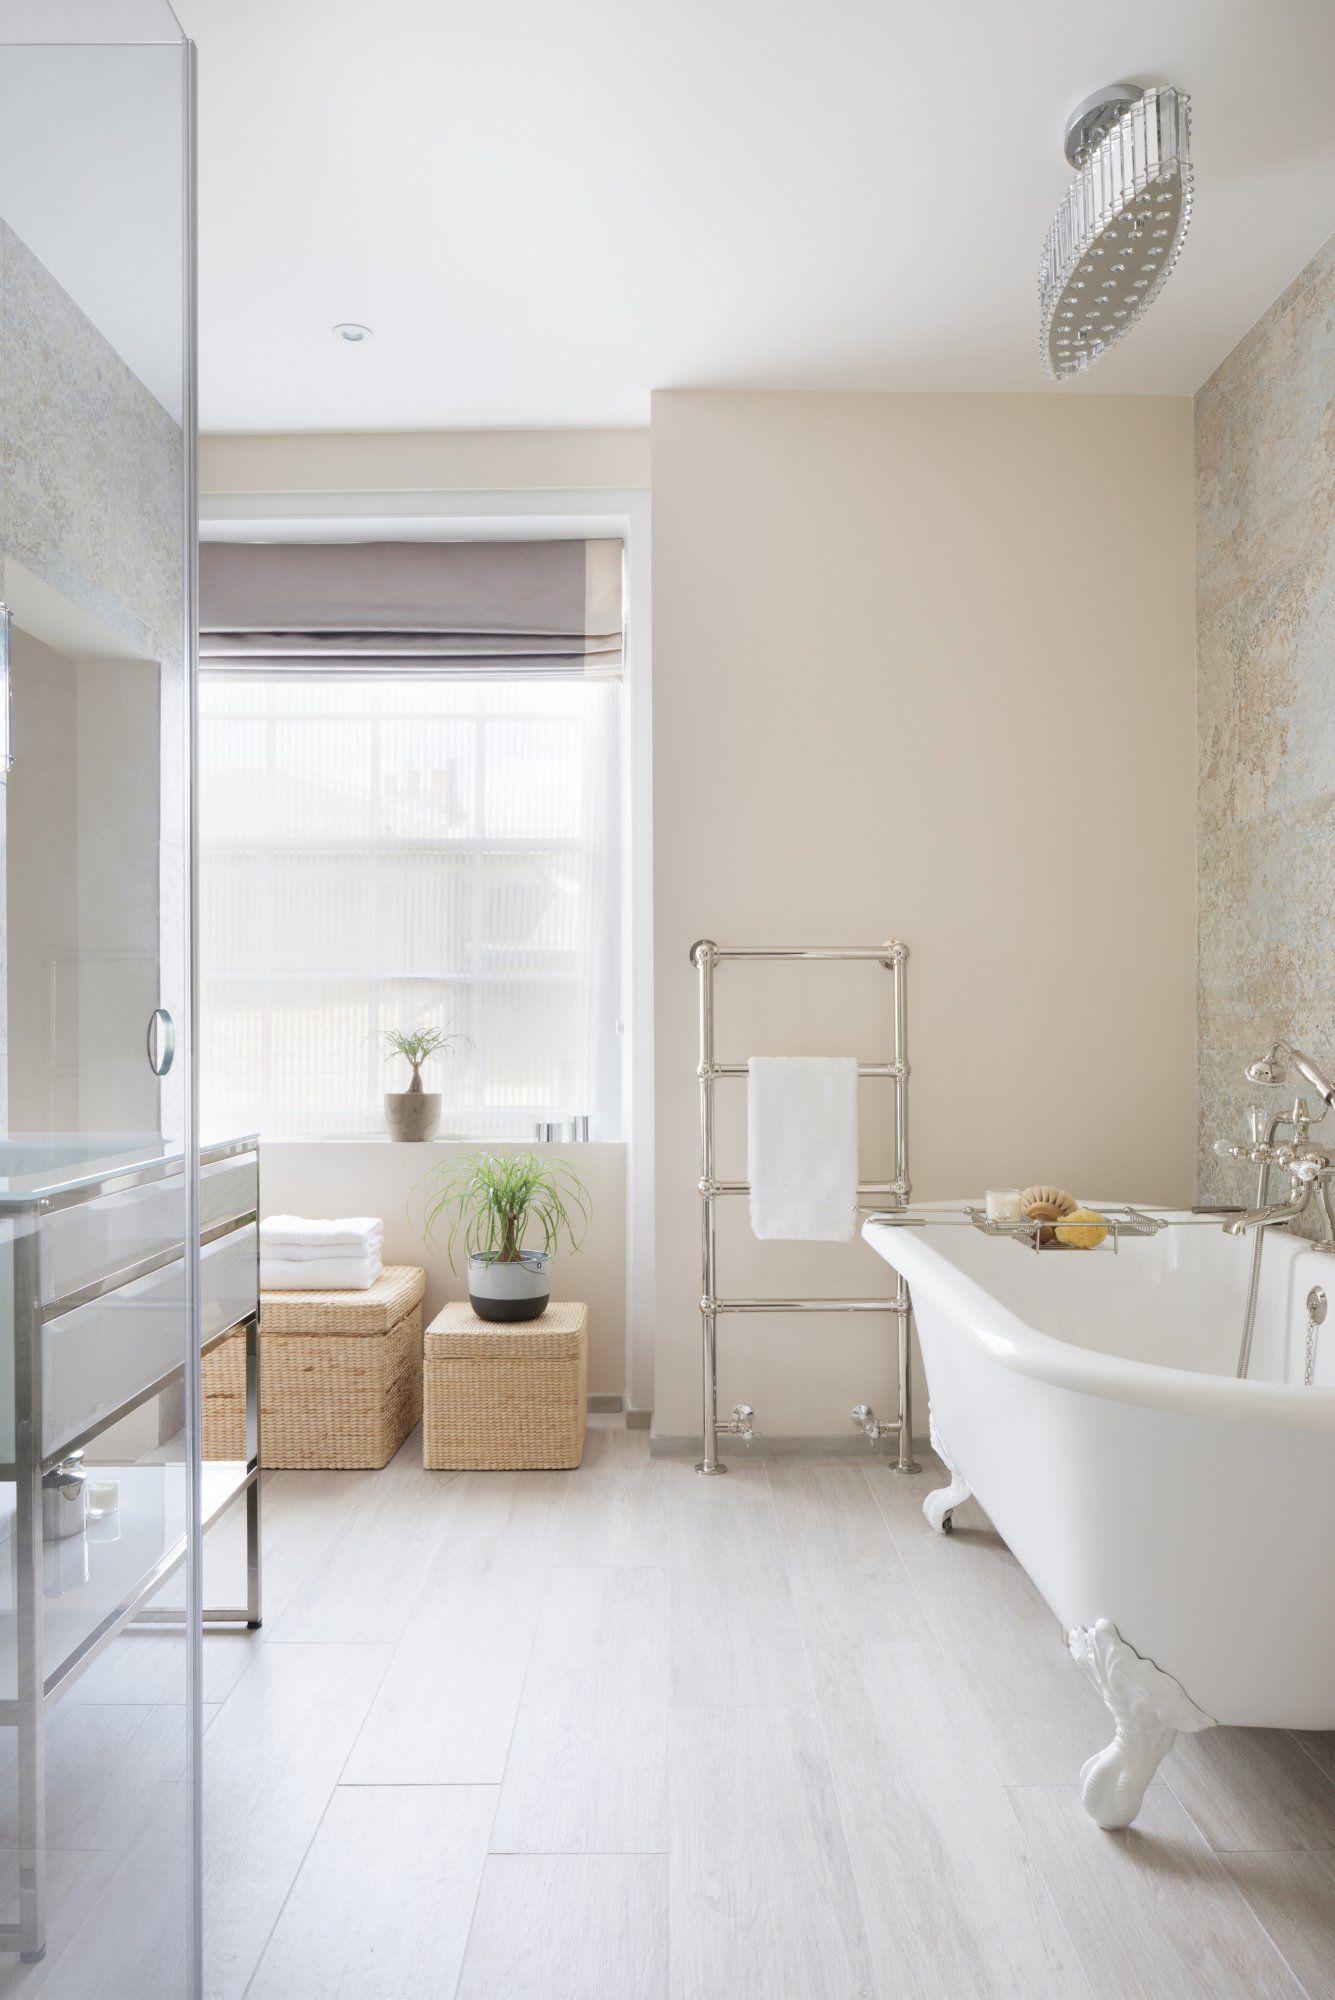 His And Hers Bathrooms Bathroom Inspiration Bathroom Inspiration Flooring Heated Towel Rail